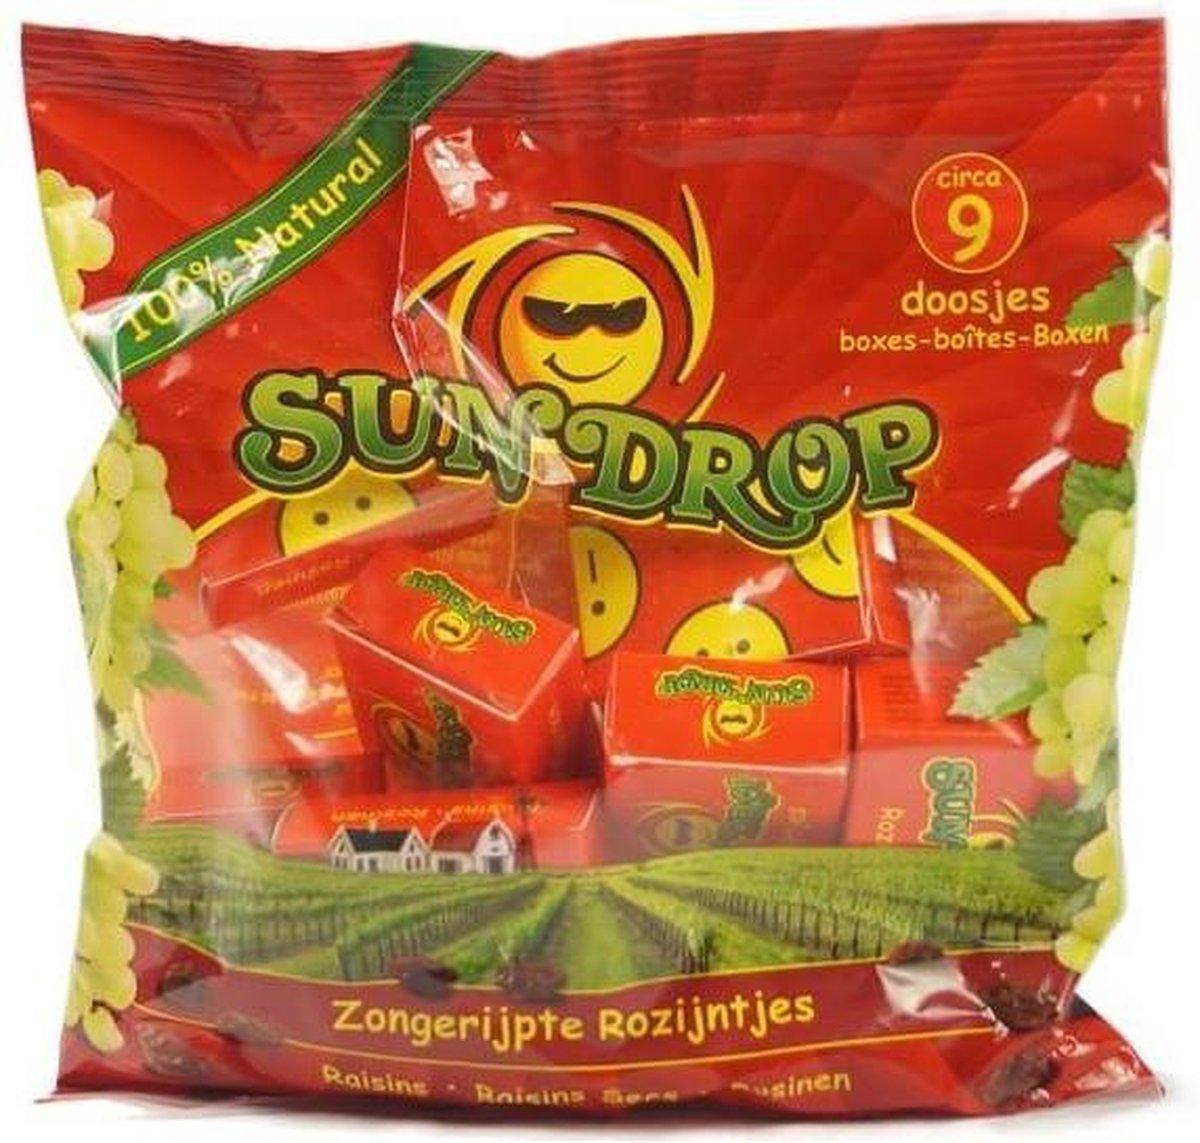 Rozijnen snoepdoosjes Sundrop - Zak 126 gram